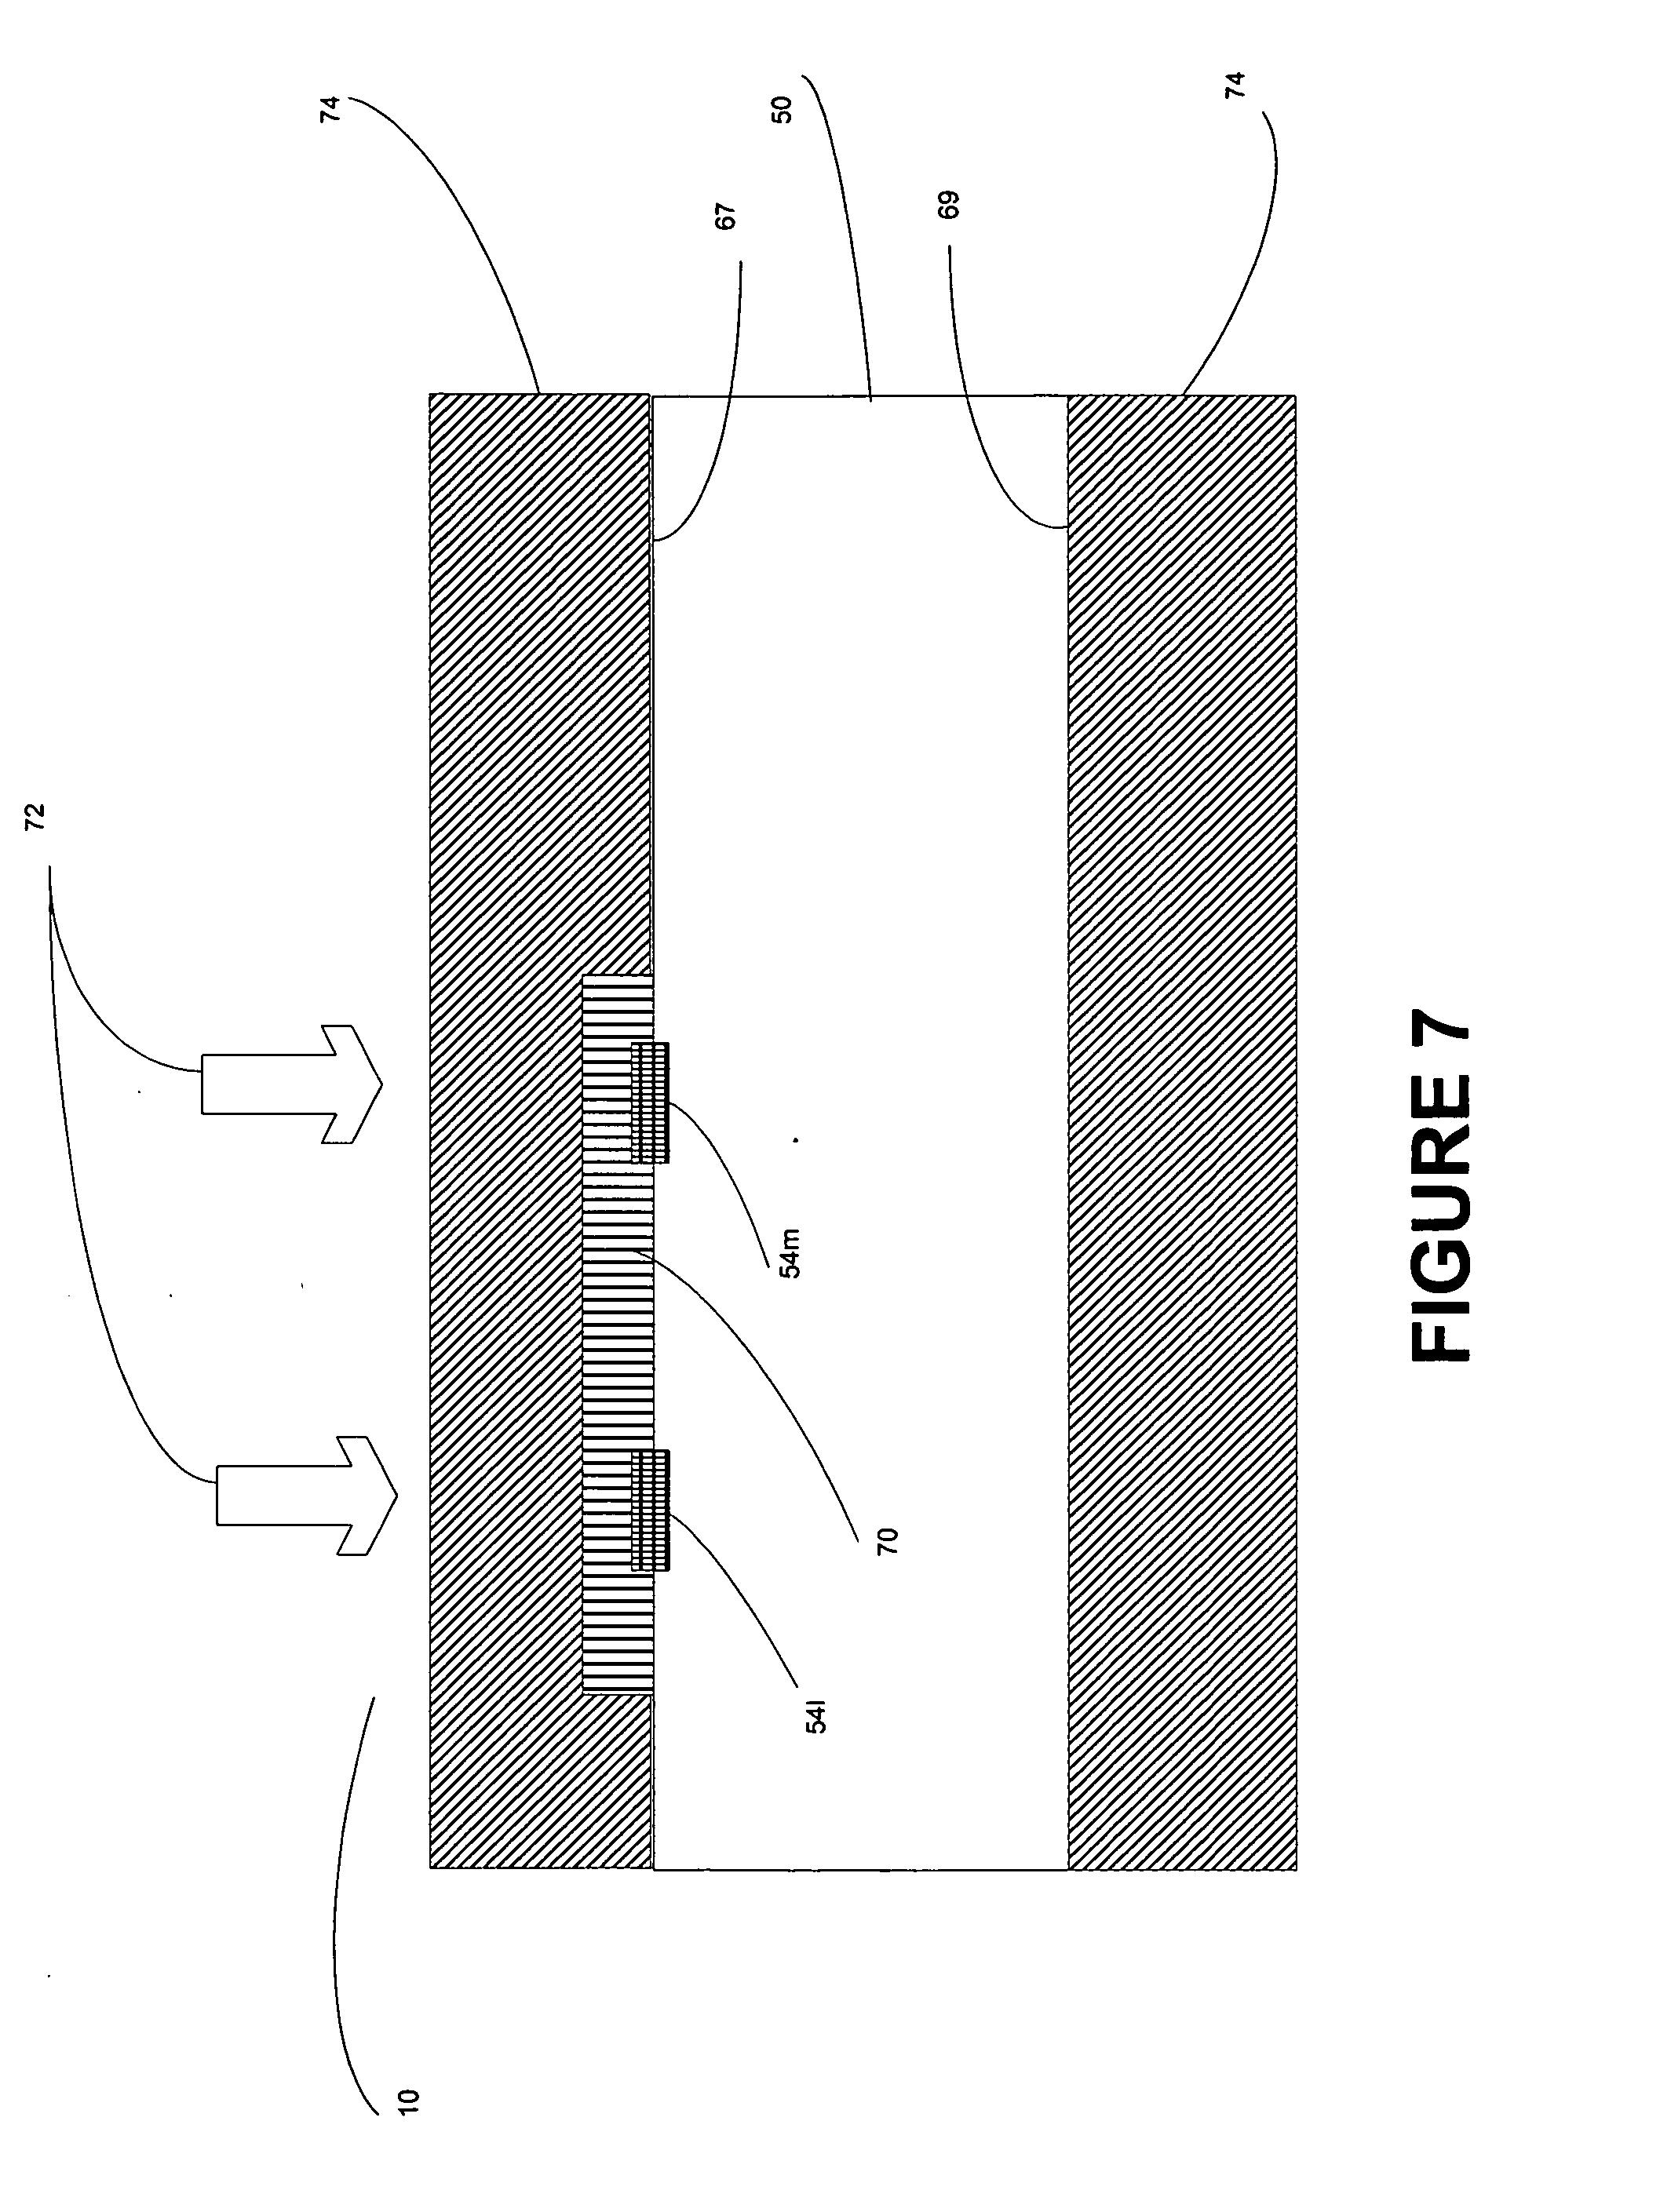 Patent US 7,728,048 B2